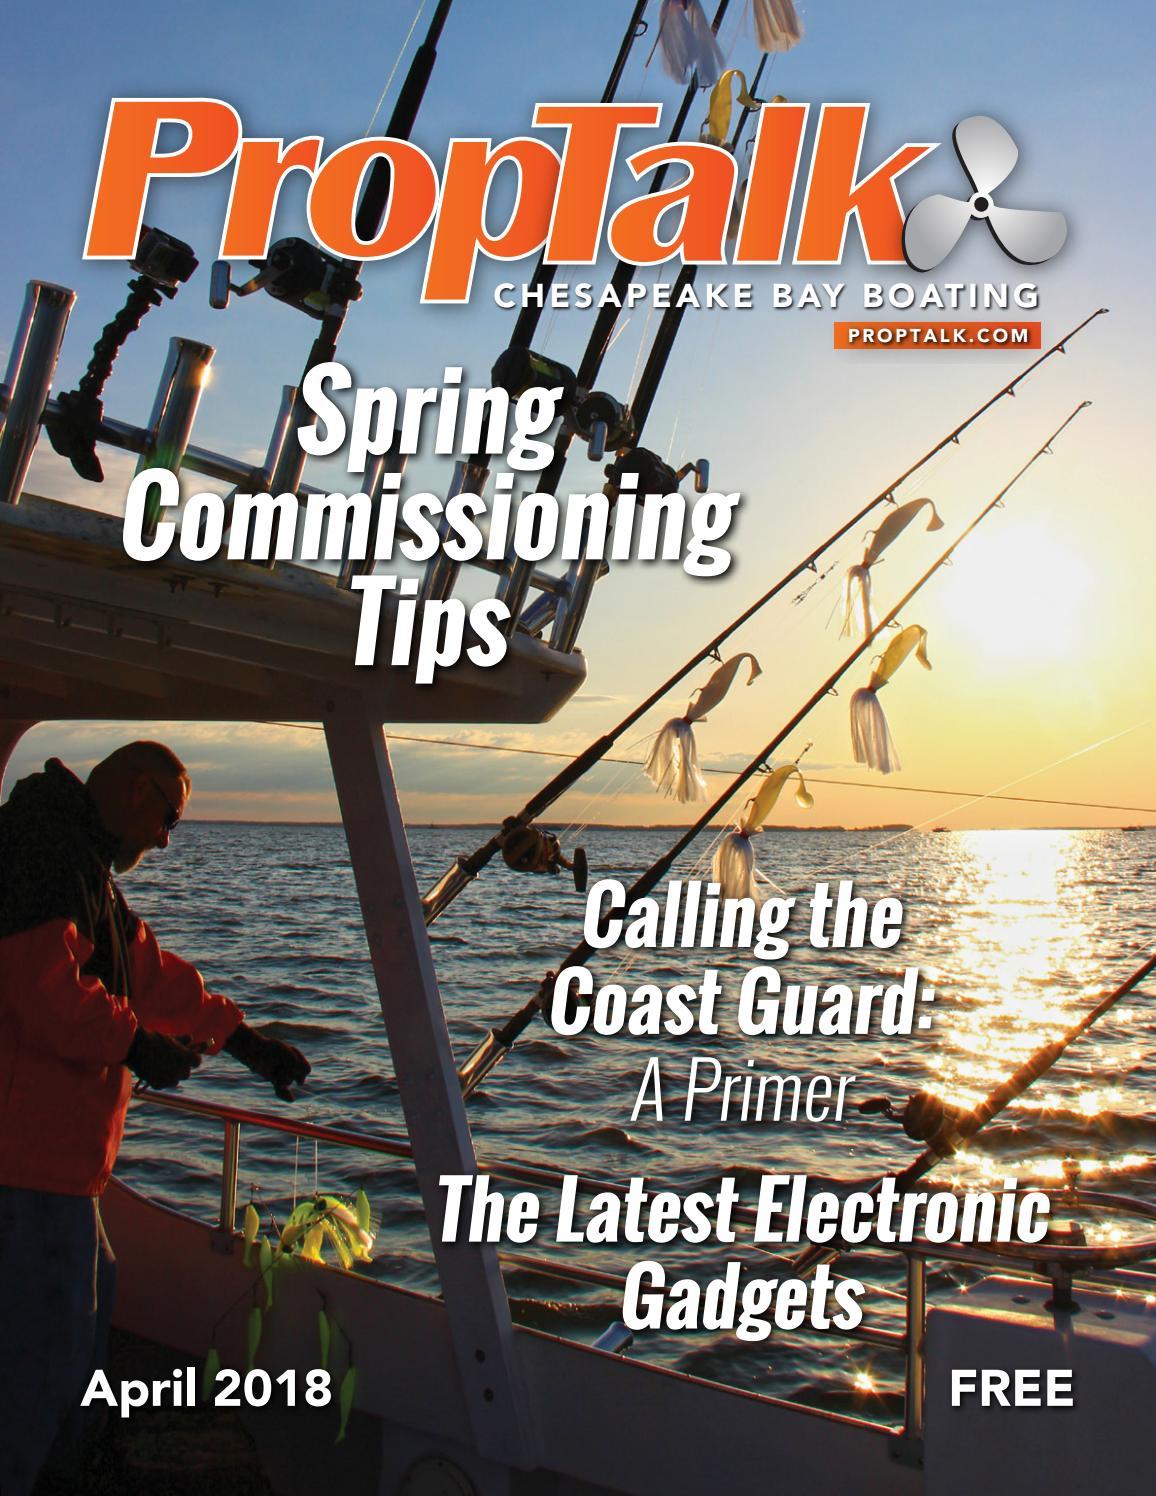 Proptalk Magazine April 2018 By Spinsheet Publishing Company Issuu